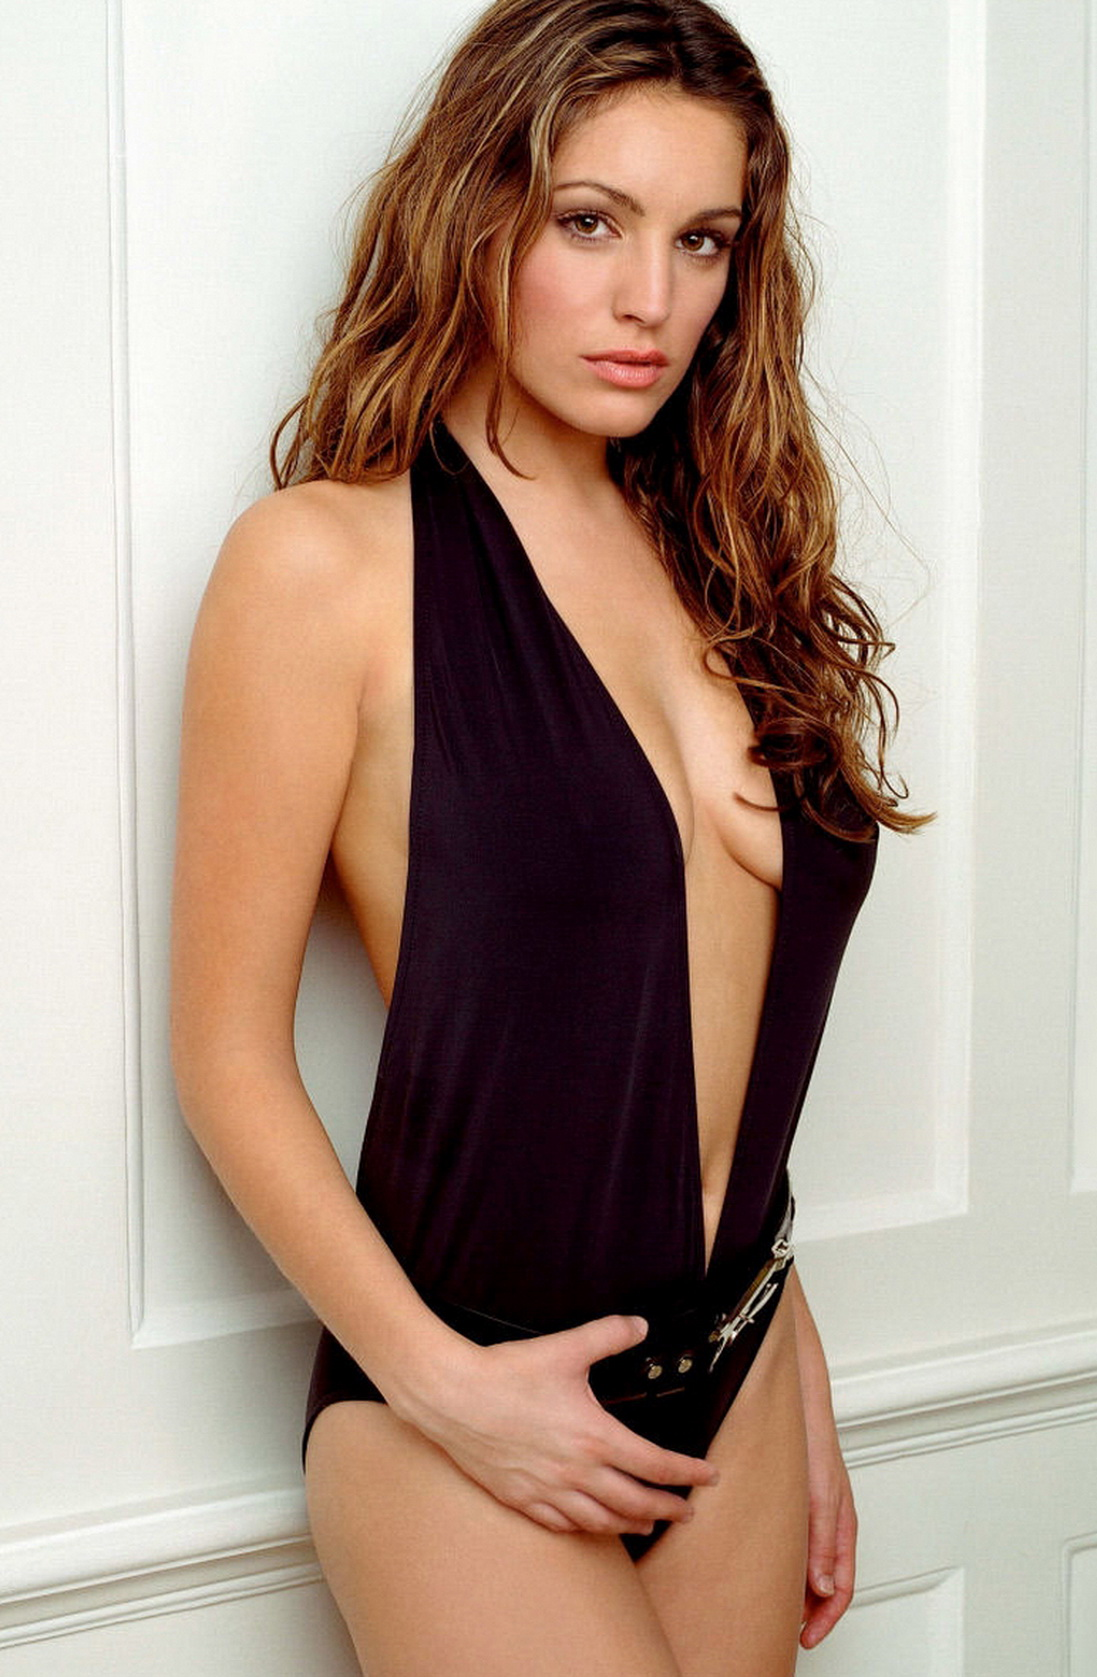 London escorts with big tits hot girls dating